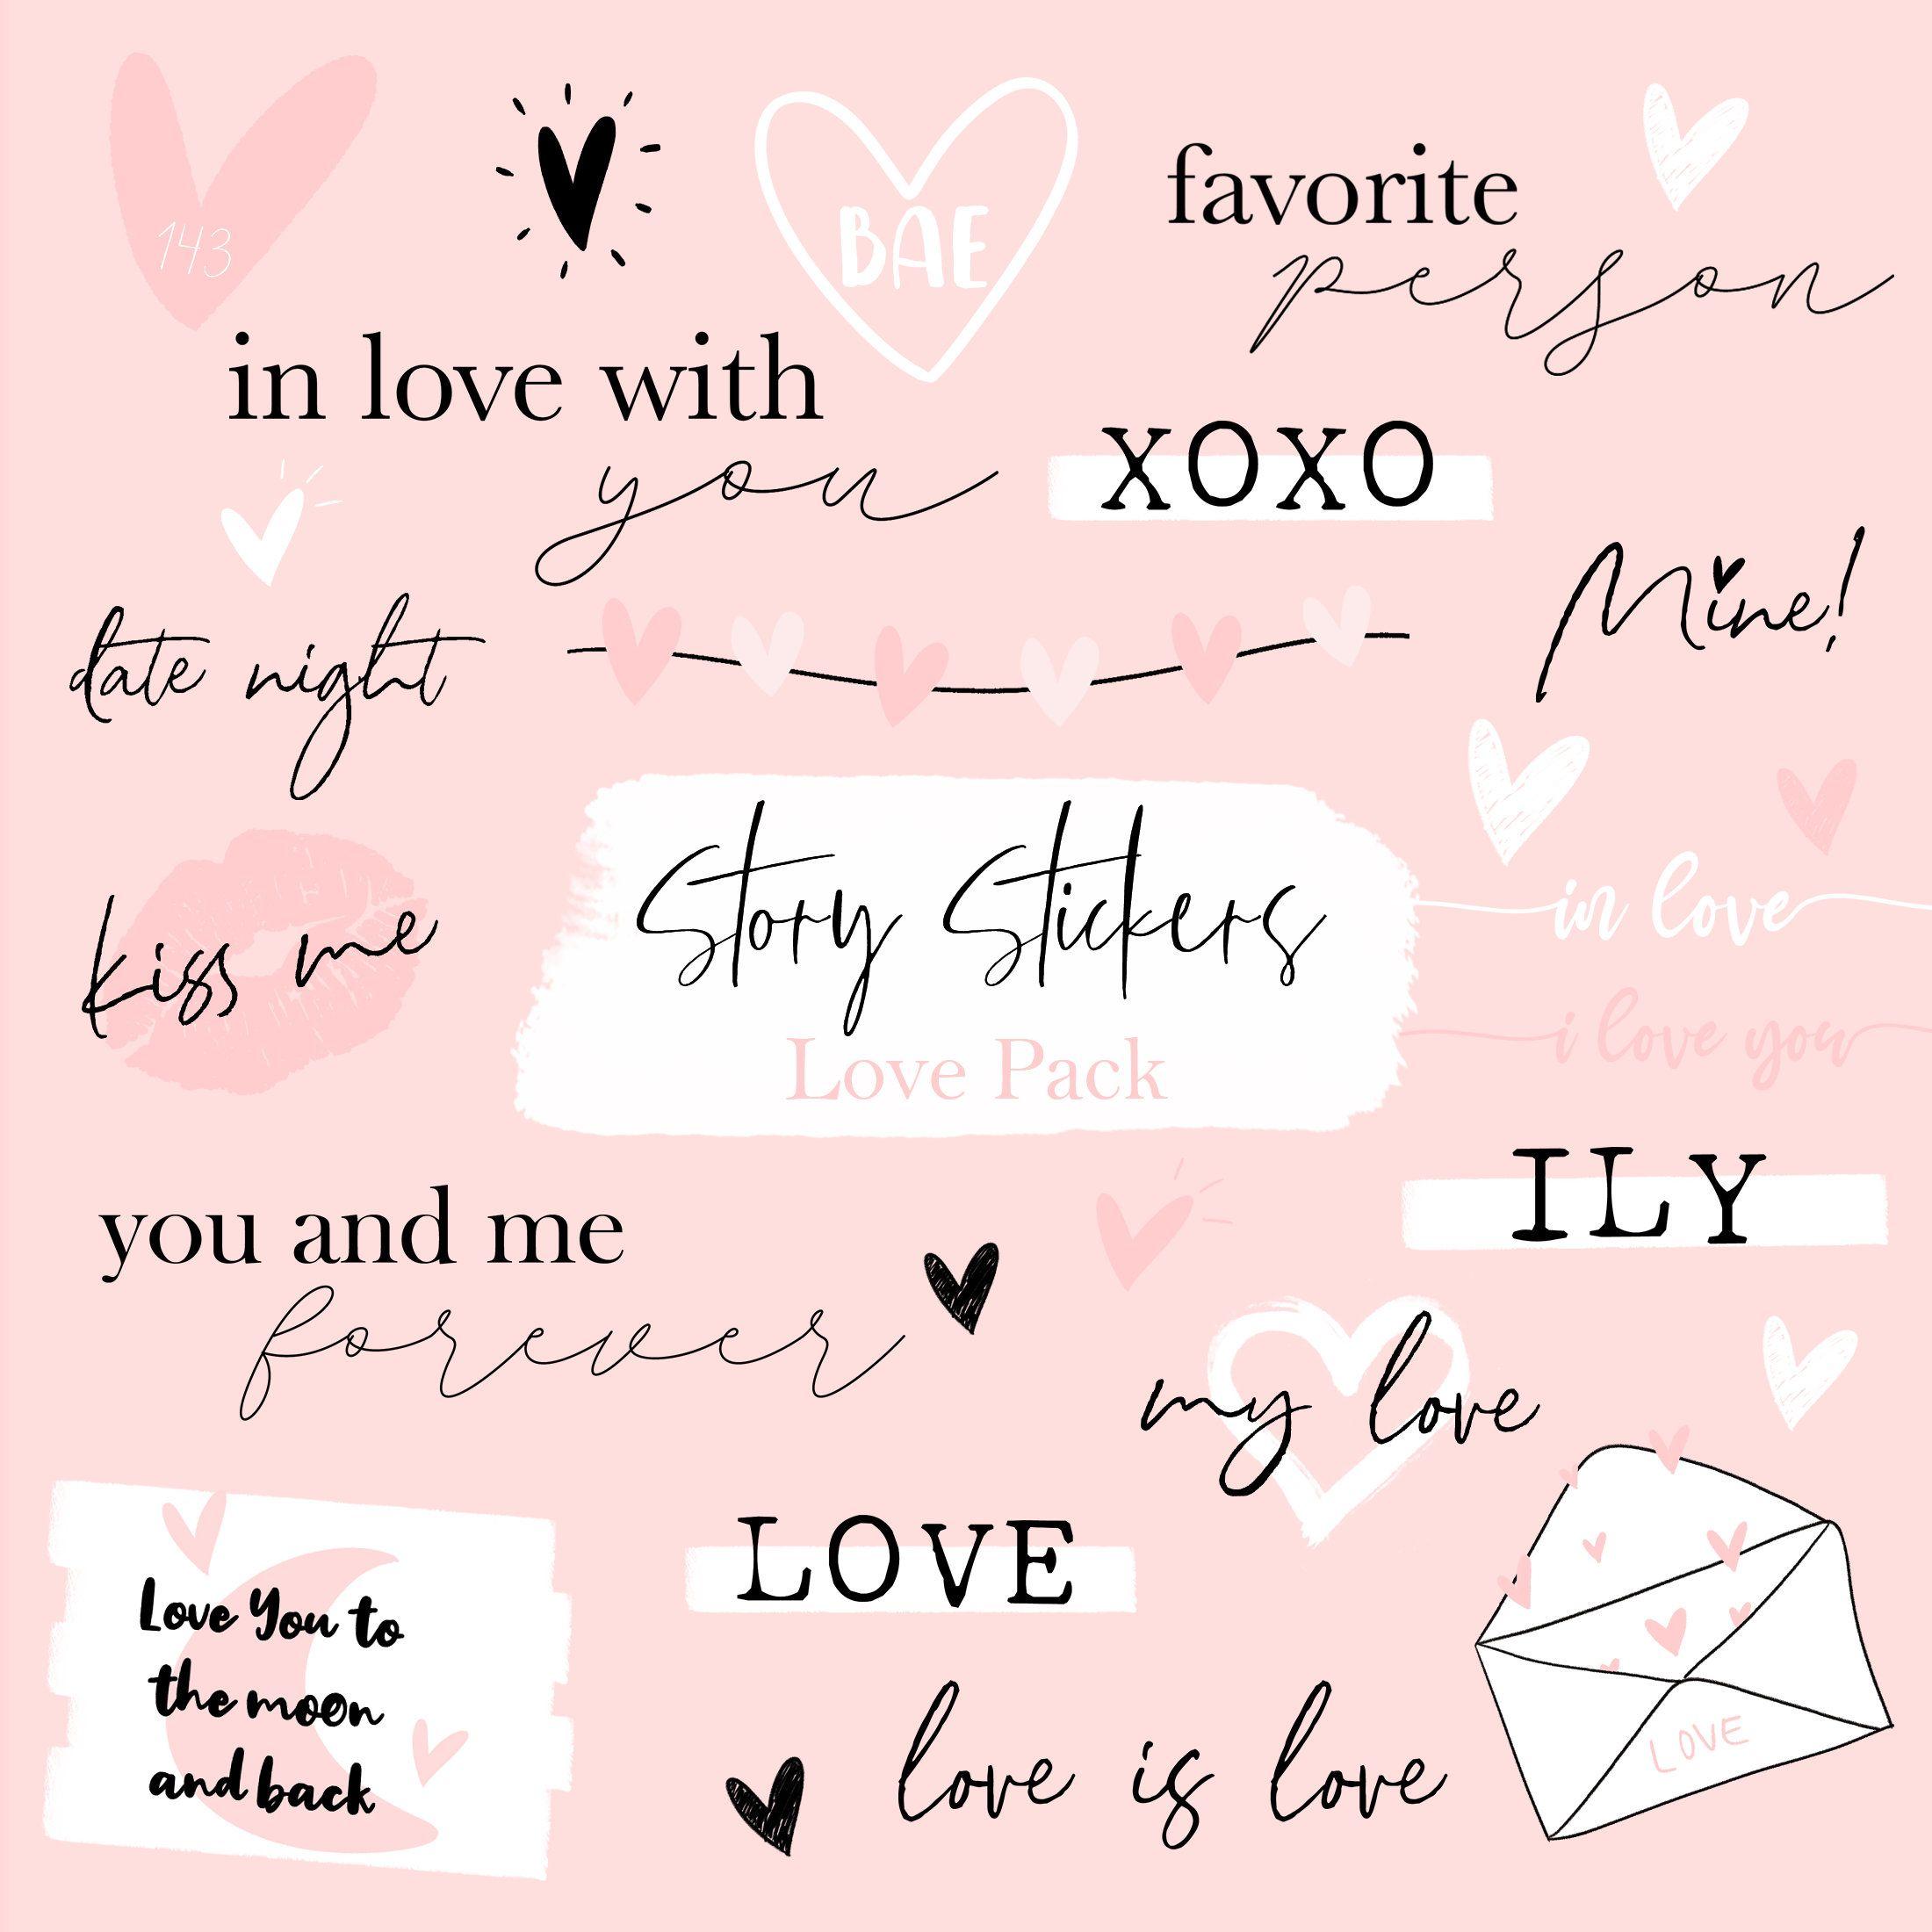 Story Sticker Instagram Story Sticker Love Story Sticker 40 Stickers Instagram Story Instagram Stickers